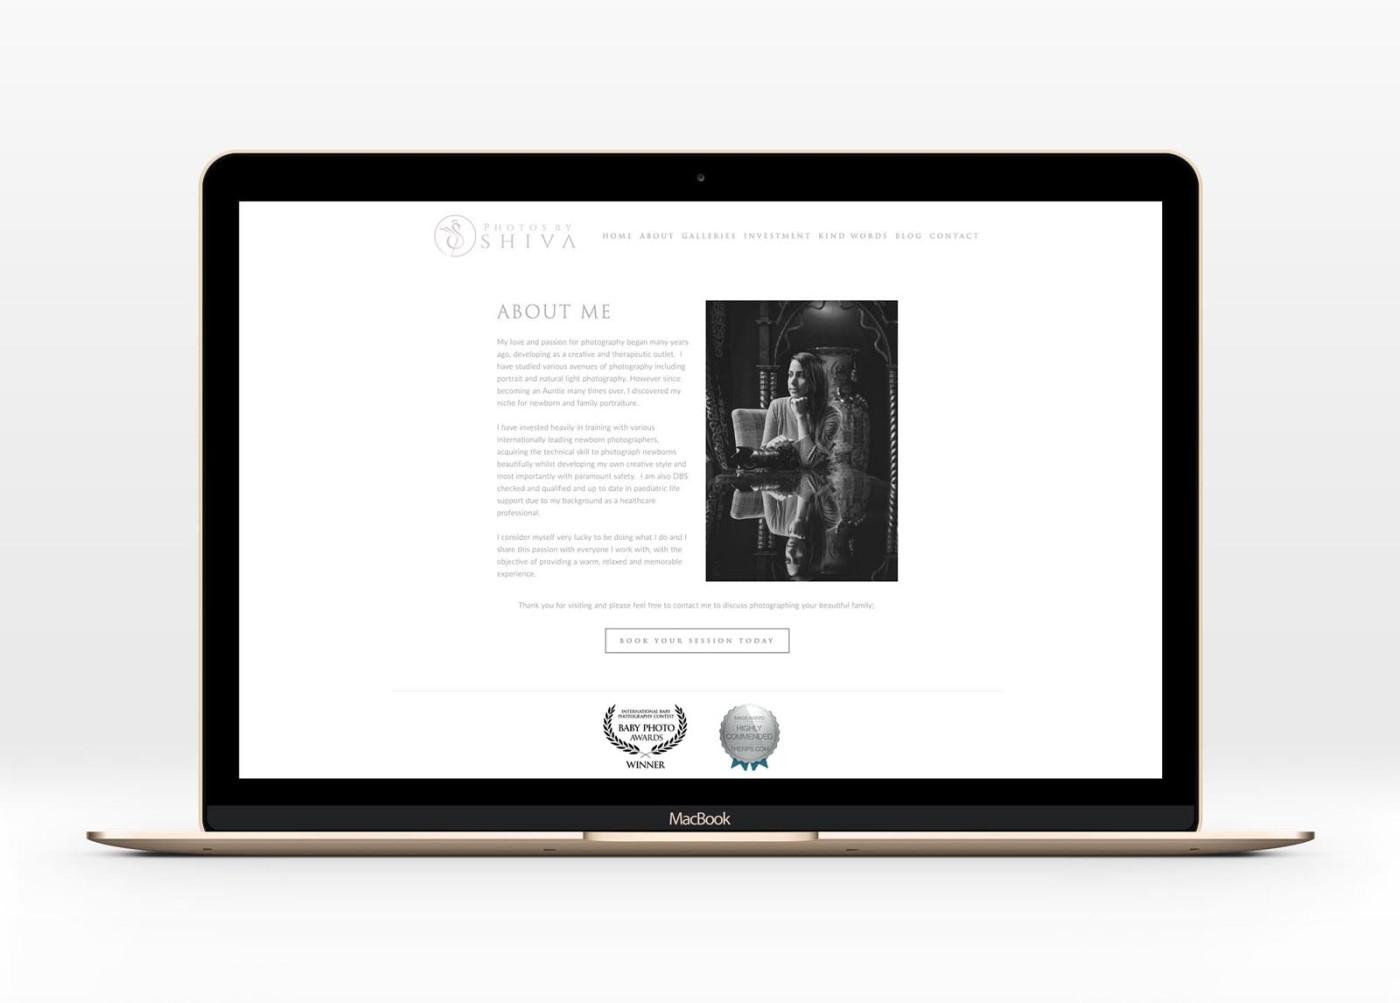 shiv website 4